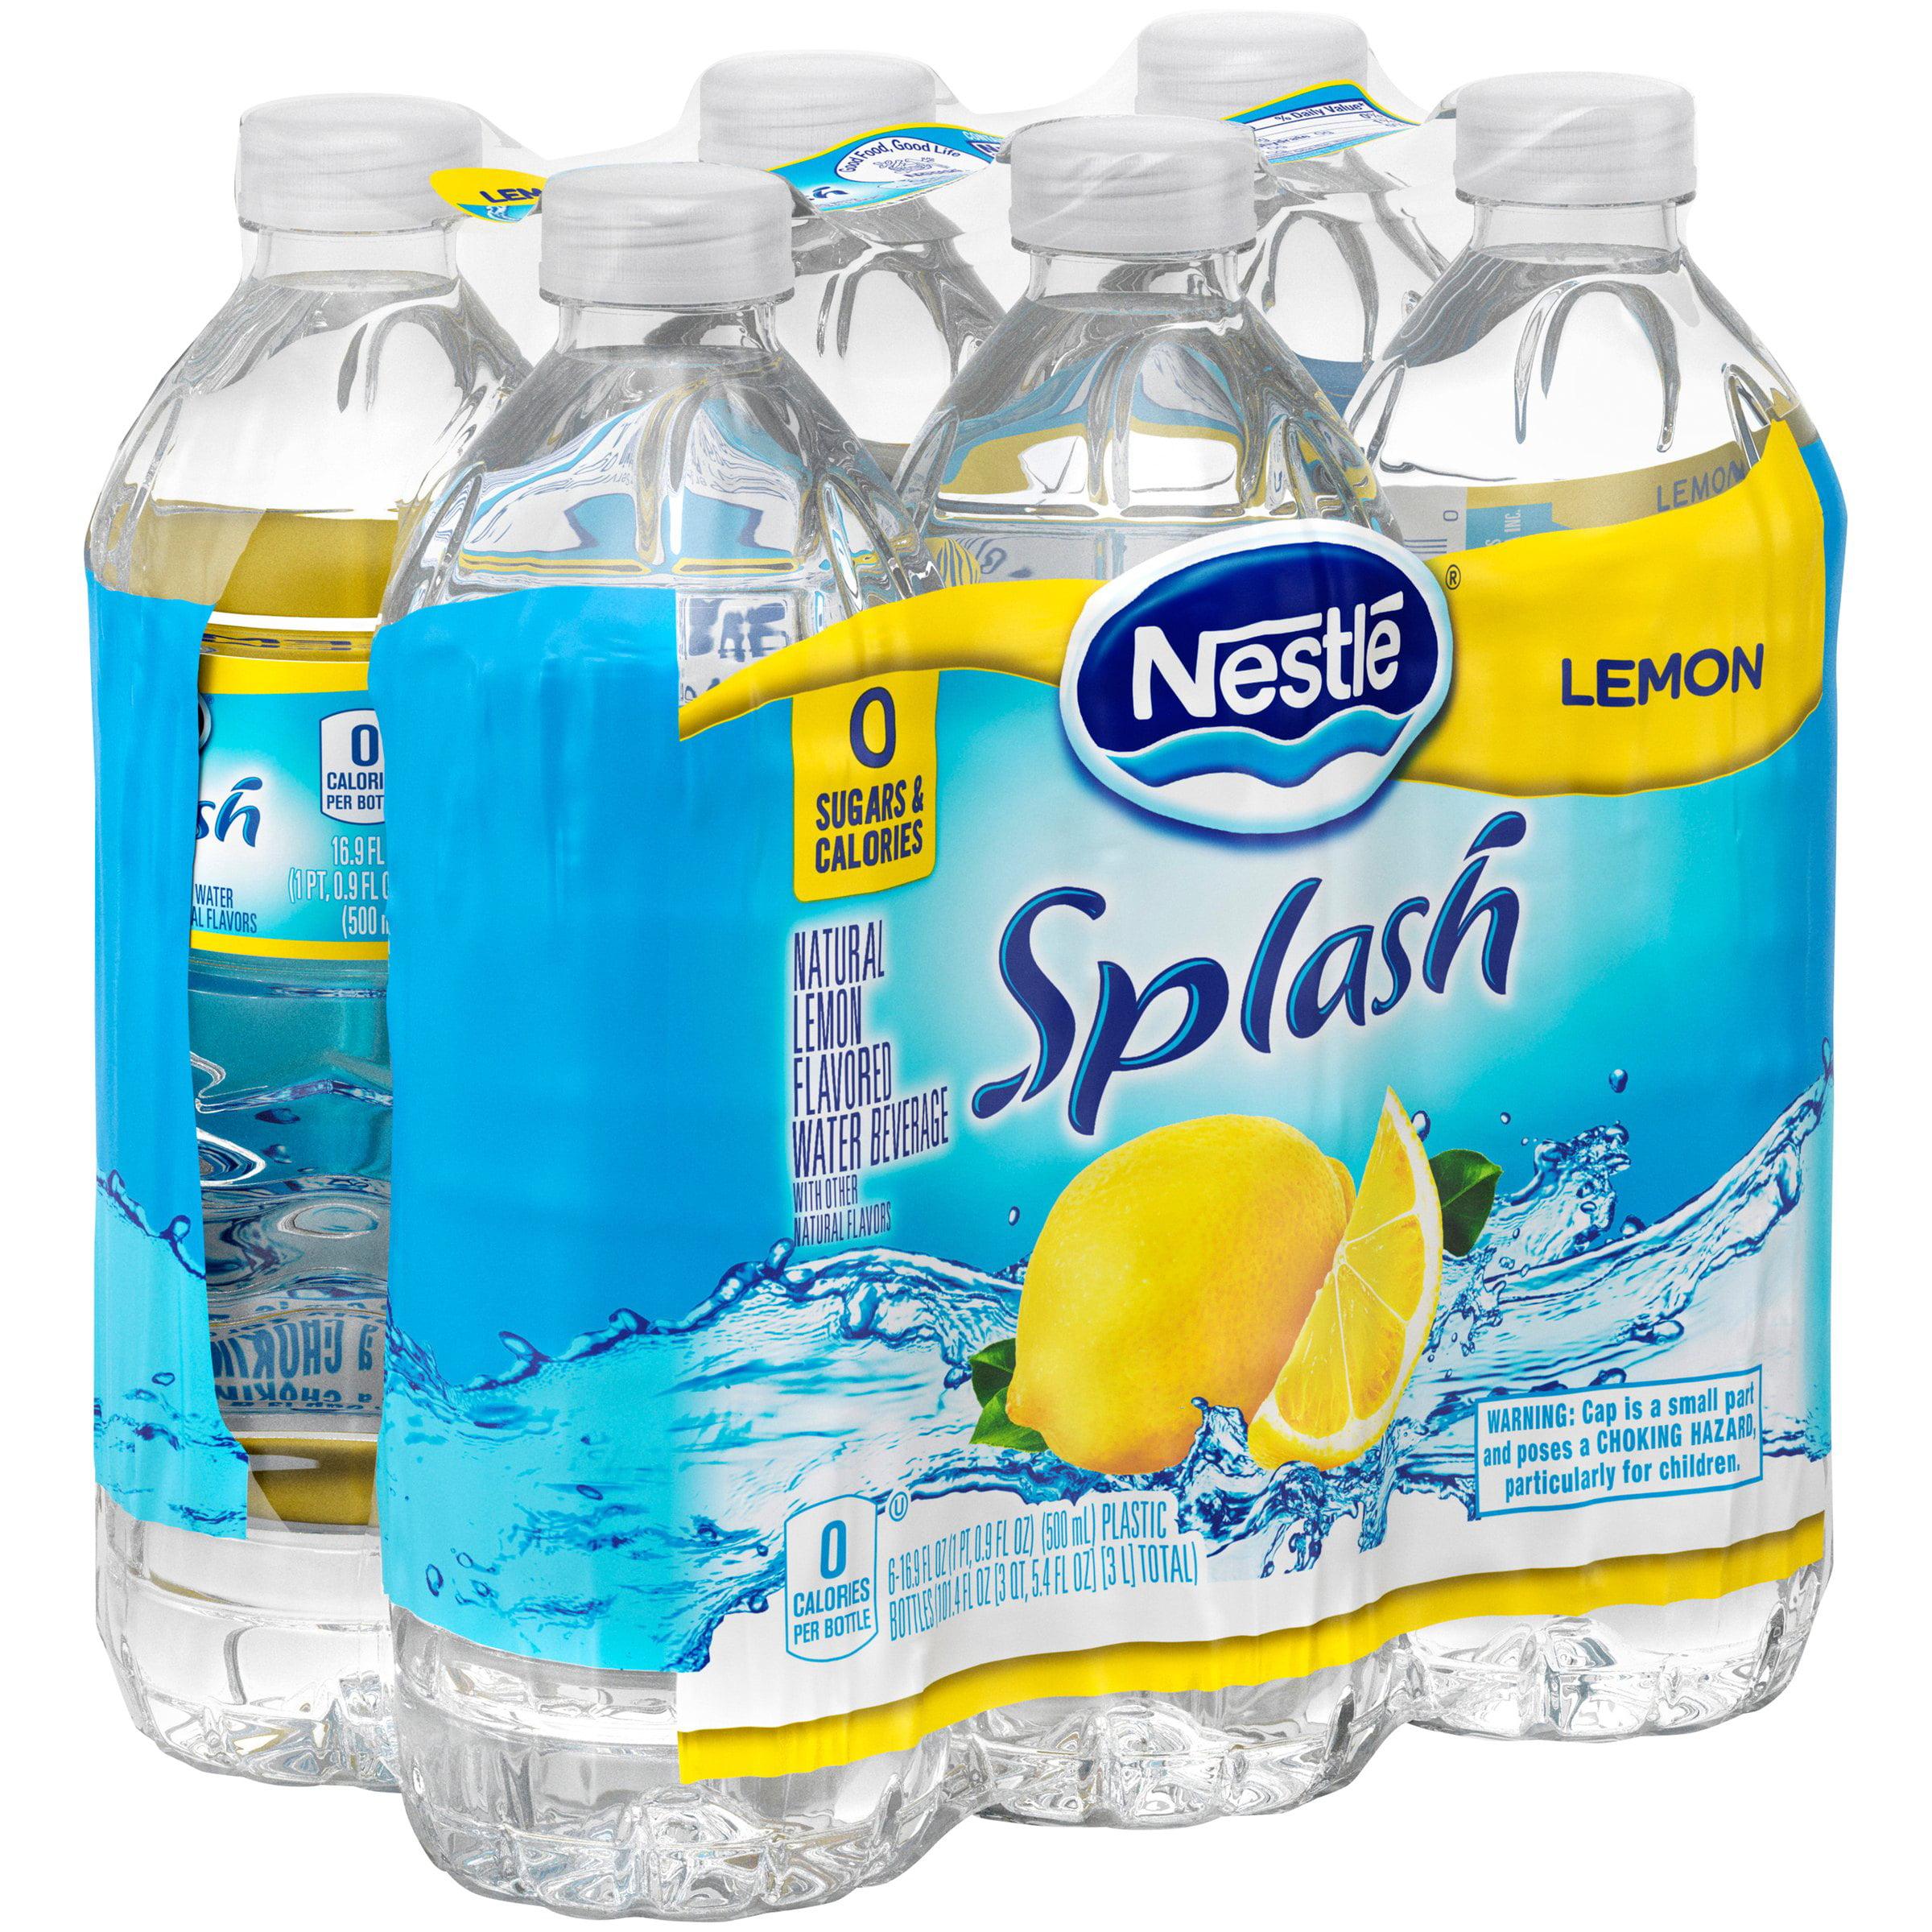 Nestle Splash Lemon Flavored Water, 16.9 Fl. Oz., 6 Count